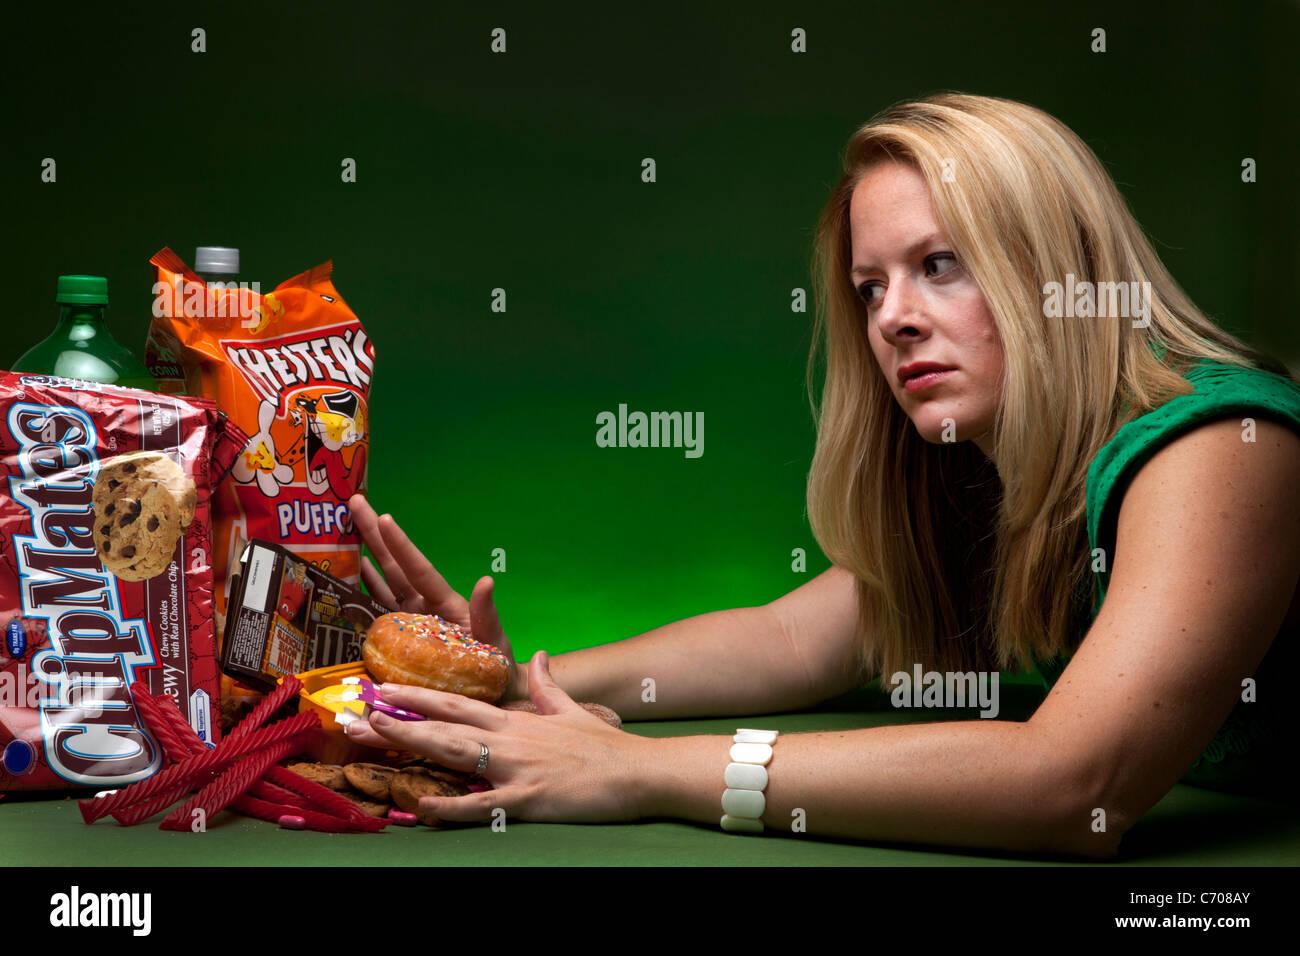 Pushing away junk food, editorial illustration - Stock Image